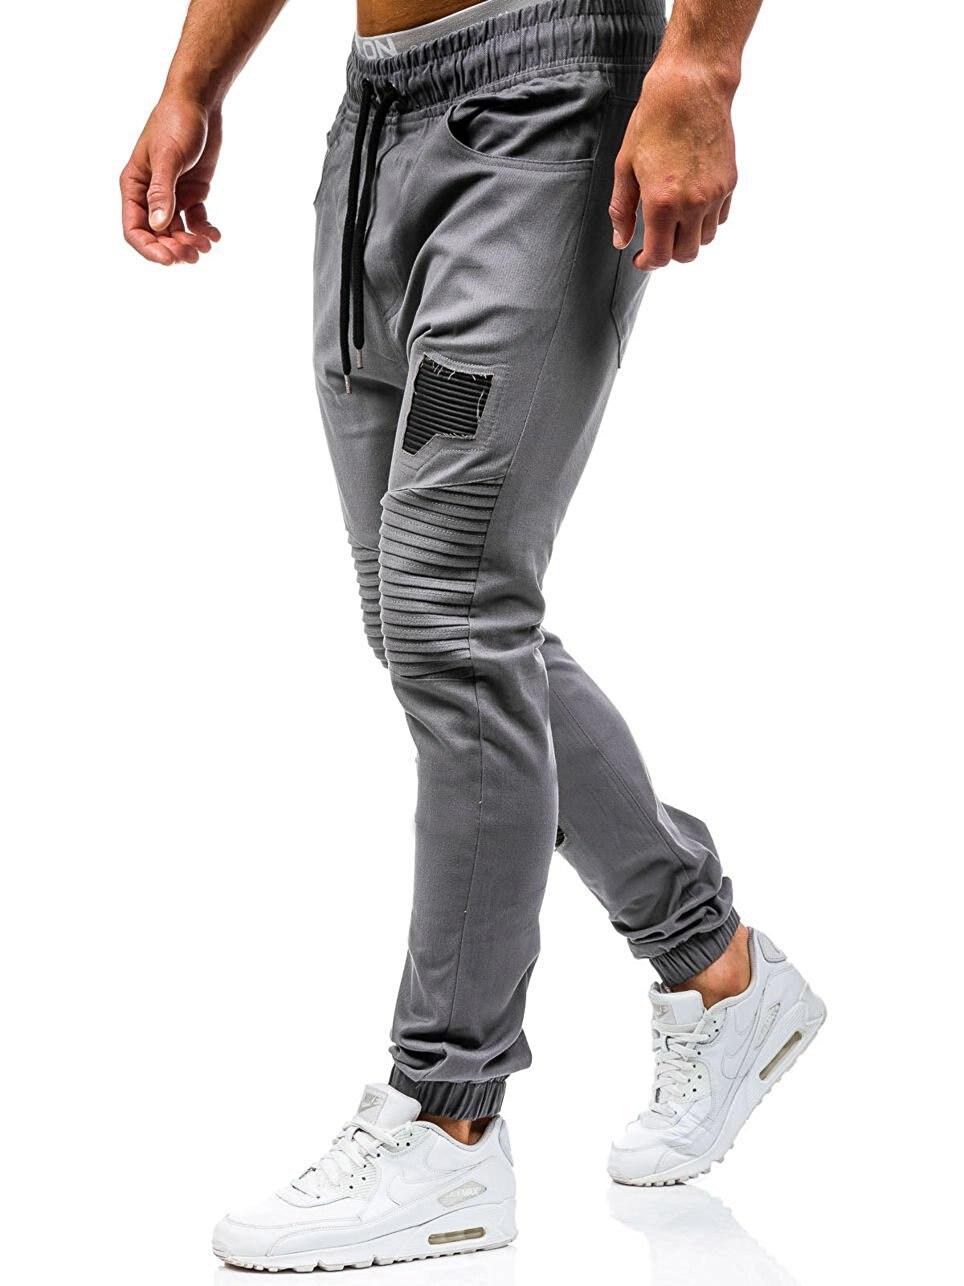 Men Sweatpants Casual Pants Slim fit Drawstring Sweatpants Slacks Elastic Waist Patchwork Pleated Ultrathin Male Trousers Jogger 22